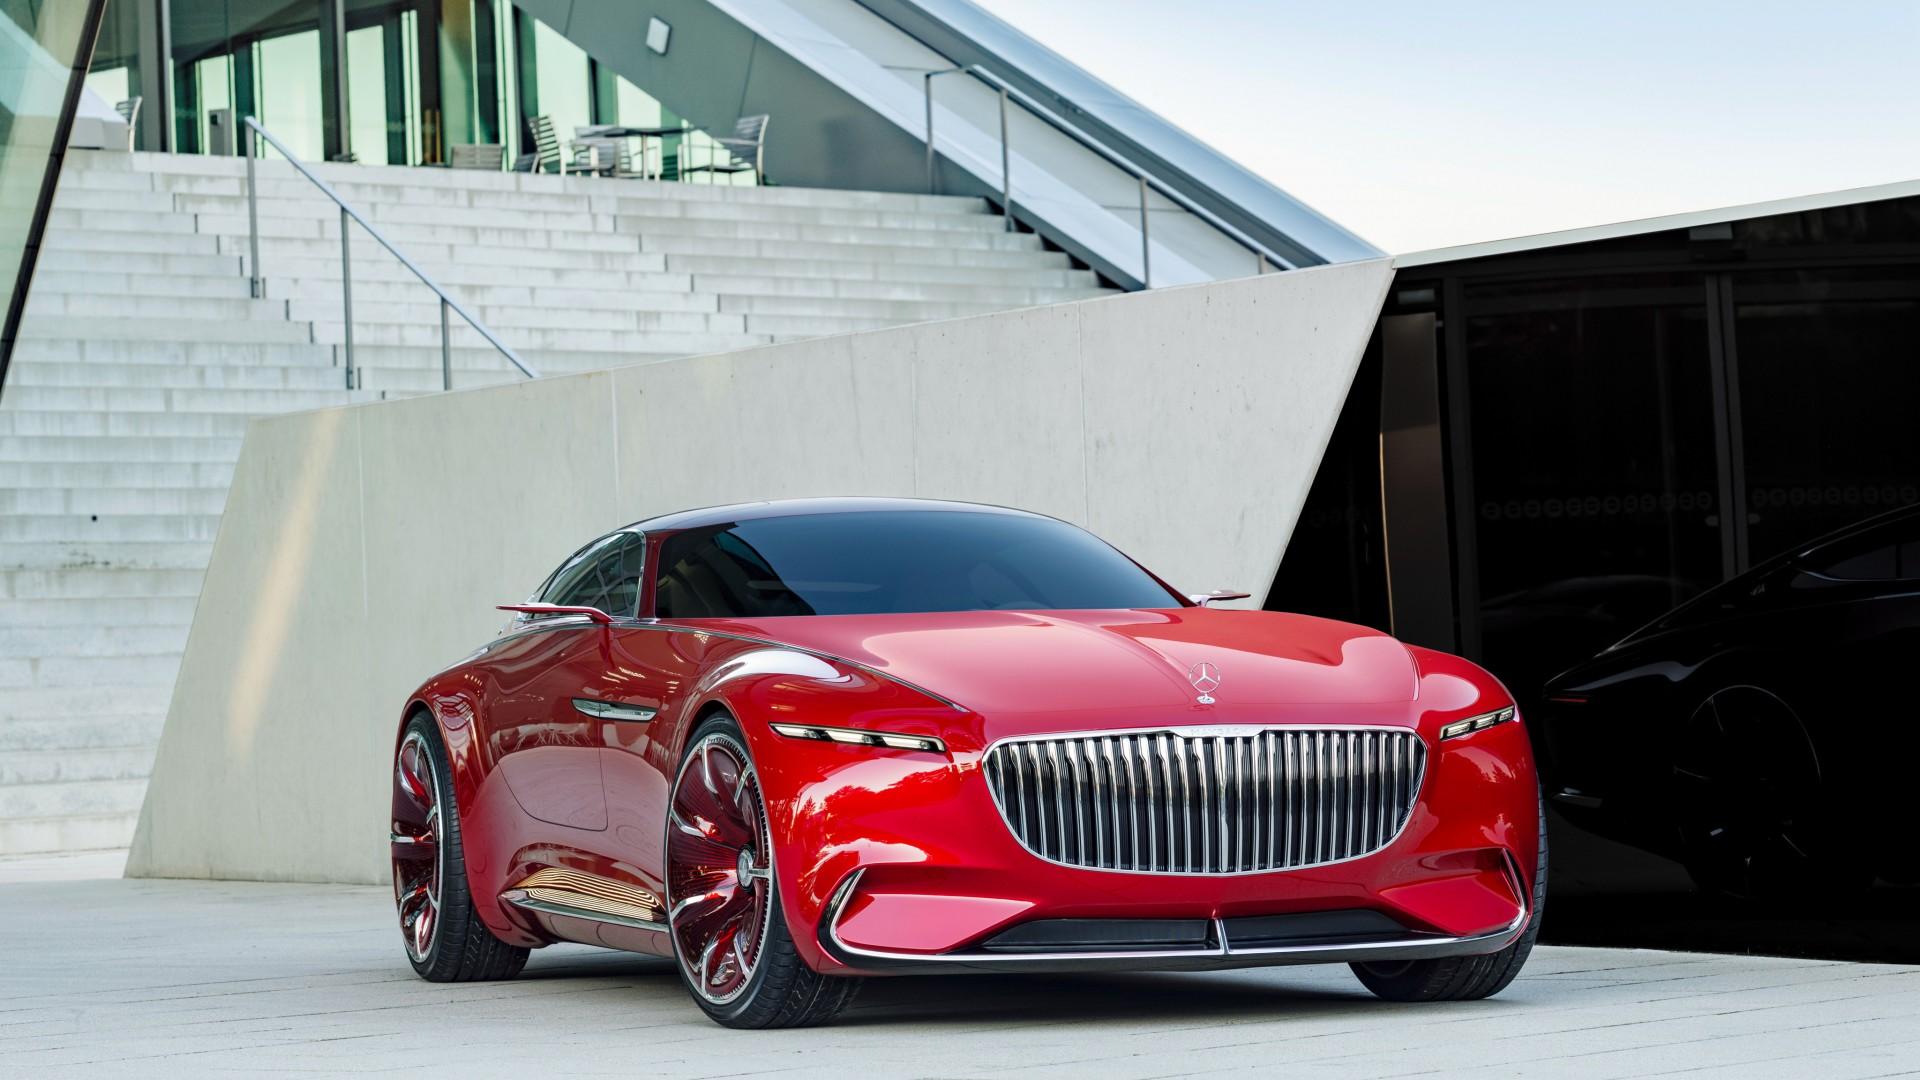 Lexus Electric Car >> 2017 Vision Mercedes Maybach 6 K Wallpaper | HD Car ...